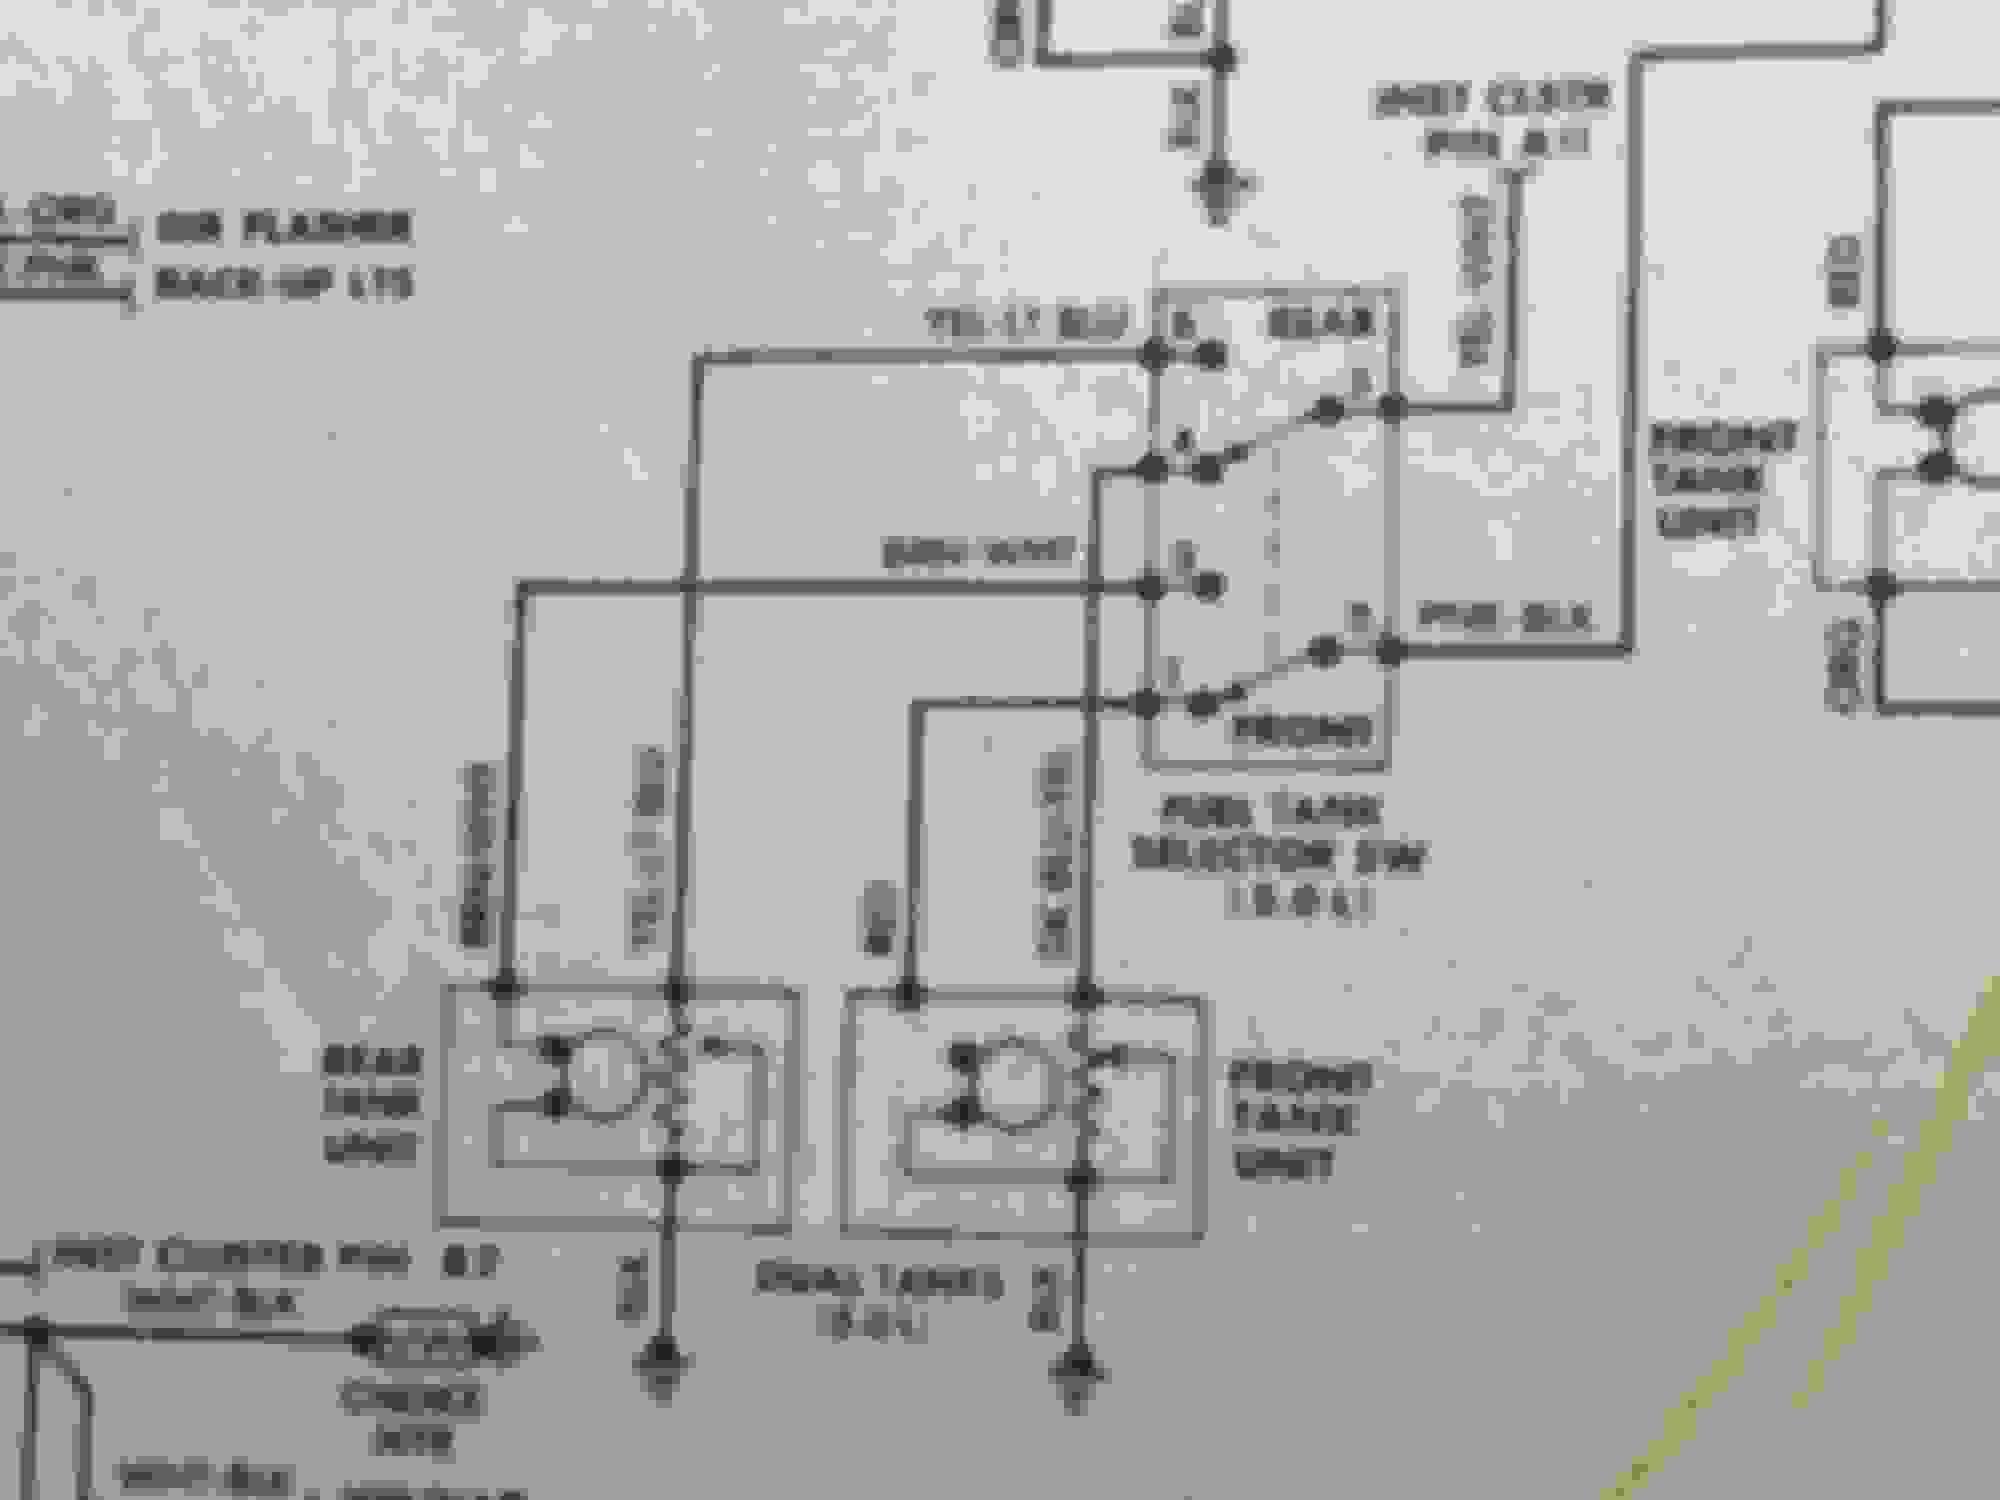 Gx 6777 Ford Truck Fuel System Diagram Truck Wont Forums Autos Weblog Download Diagram